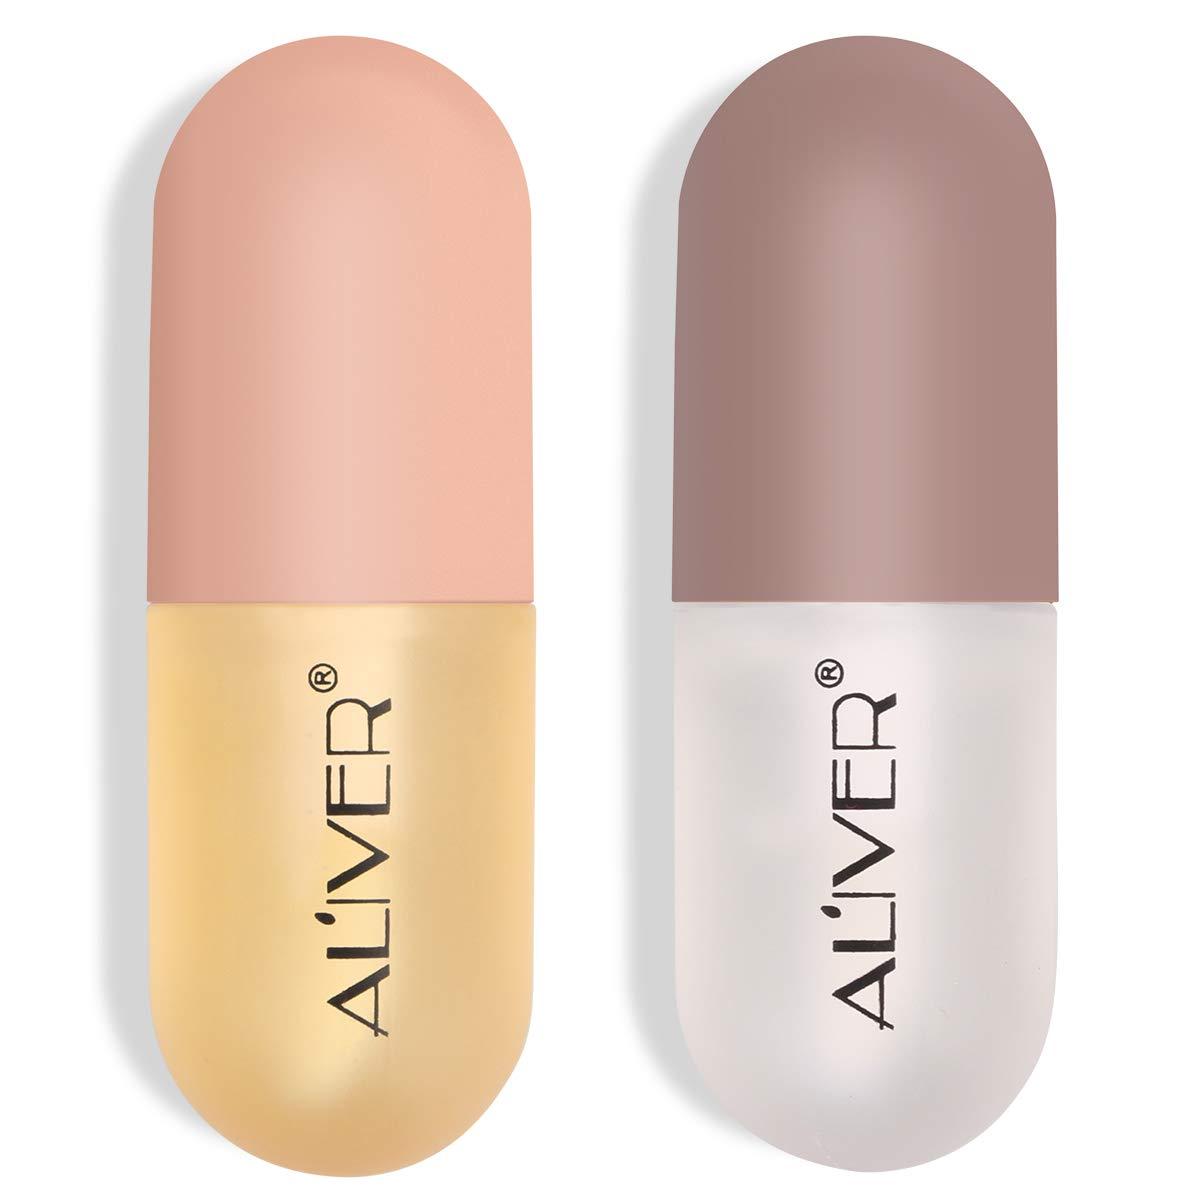 Lip Plumper Set,Lip Enhancer, Lip Plumping Balm,Moisturizing Clear Lip Gloss for Fuller Lips & Hydrated Beauty Lips